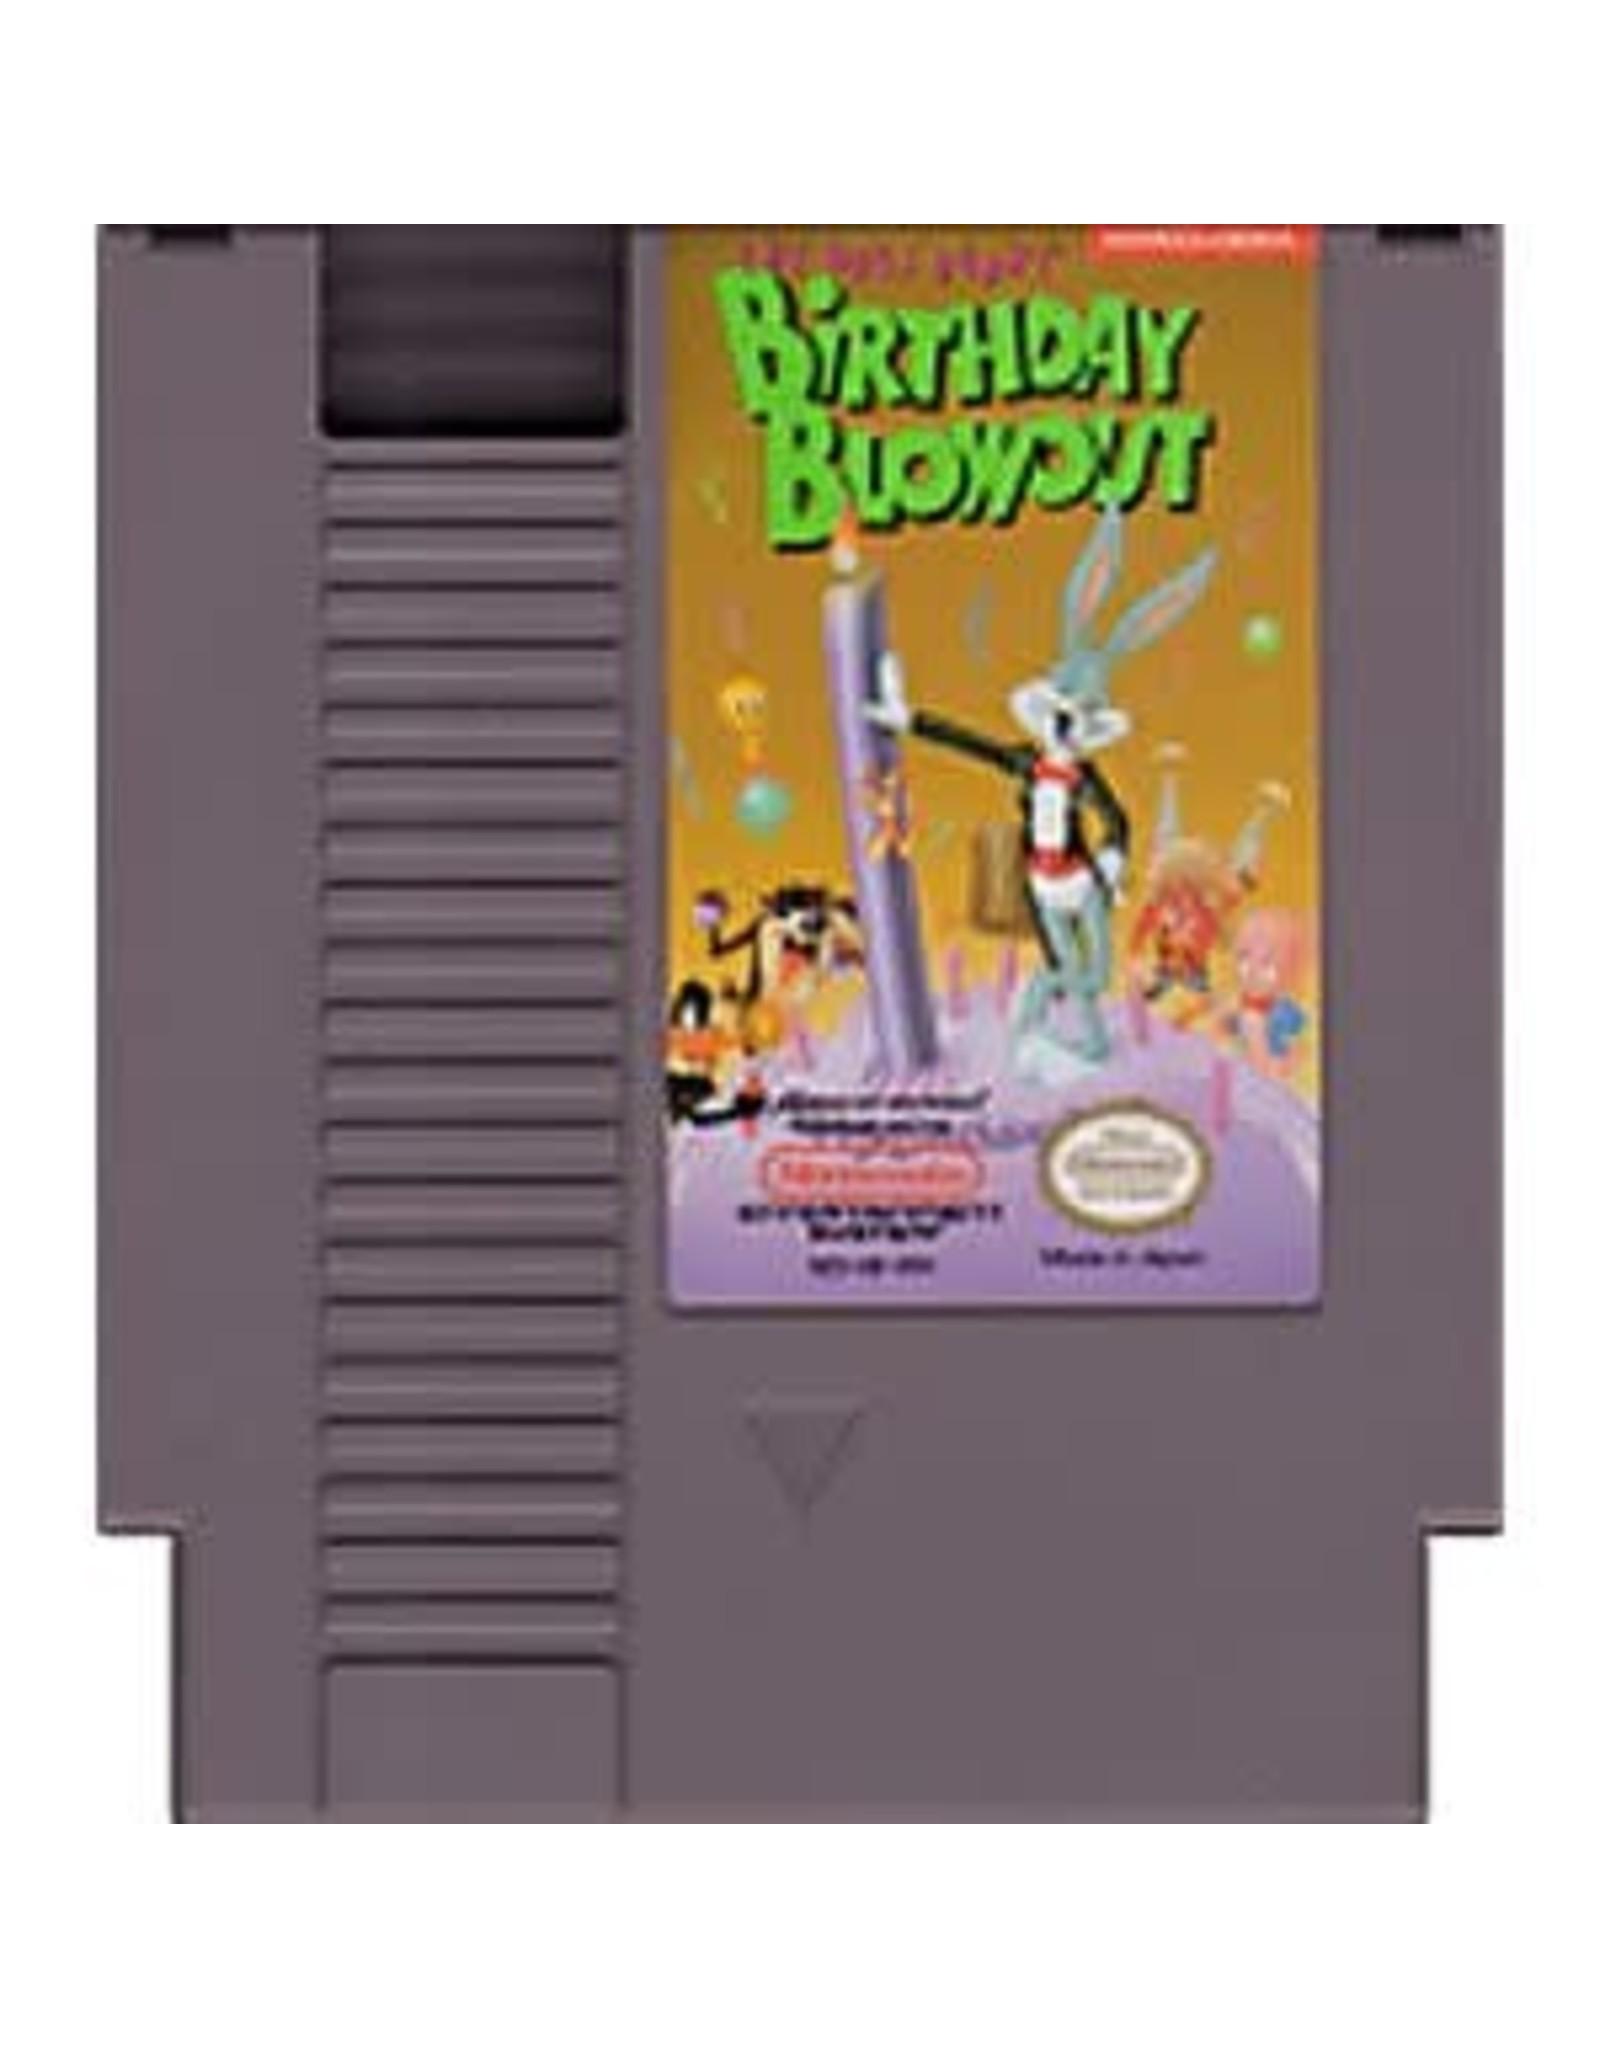 Bugs Bunny Birthday Blowout (NES)